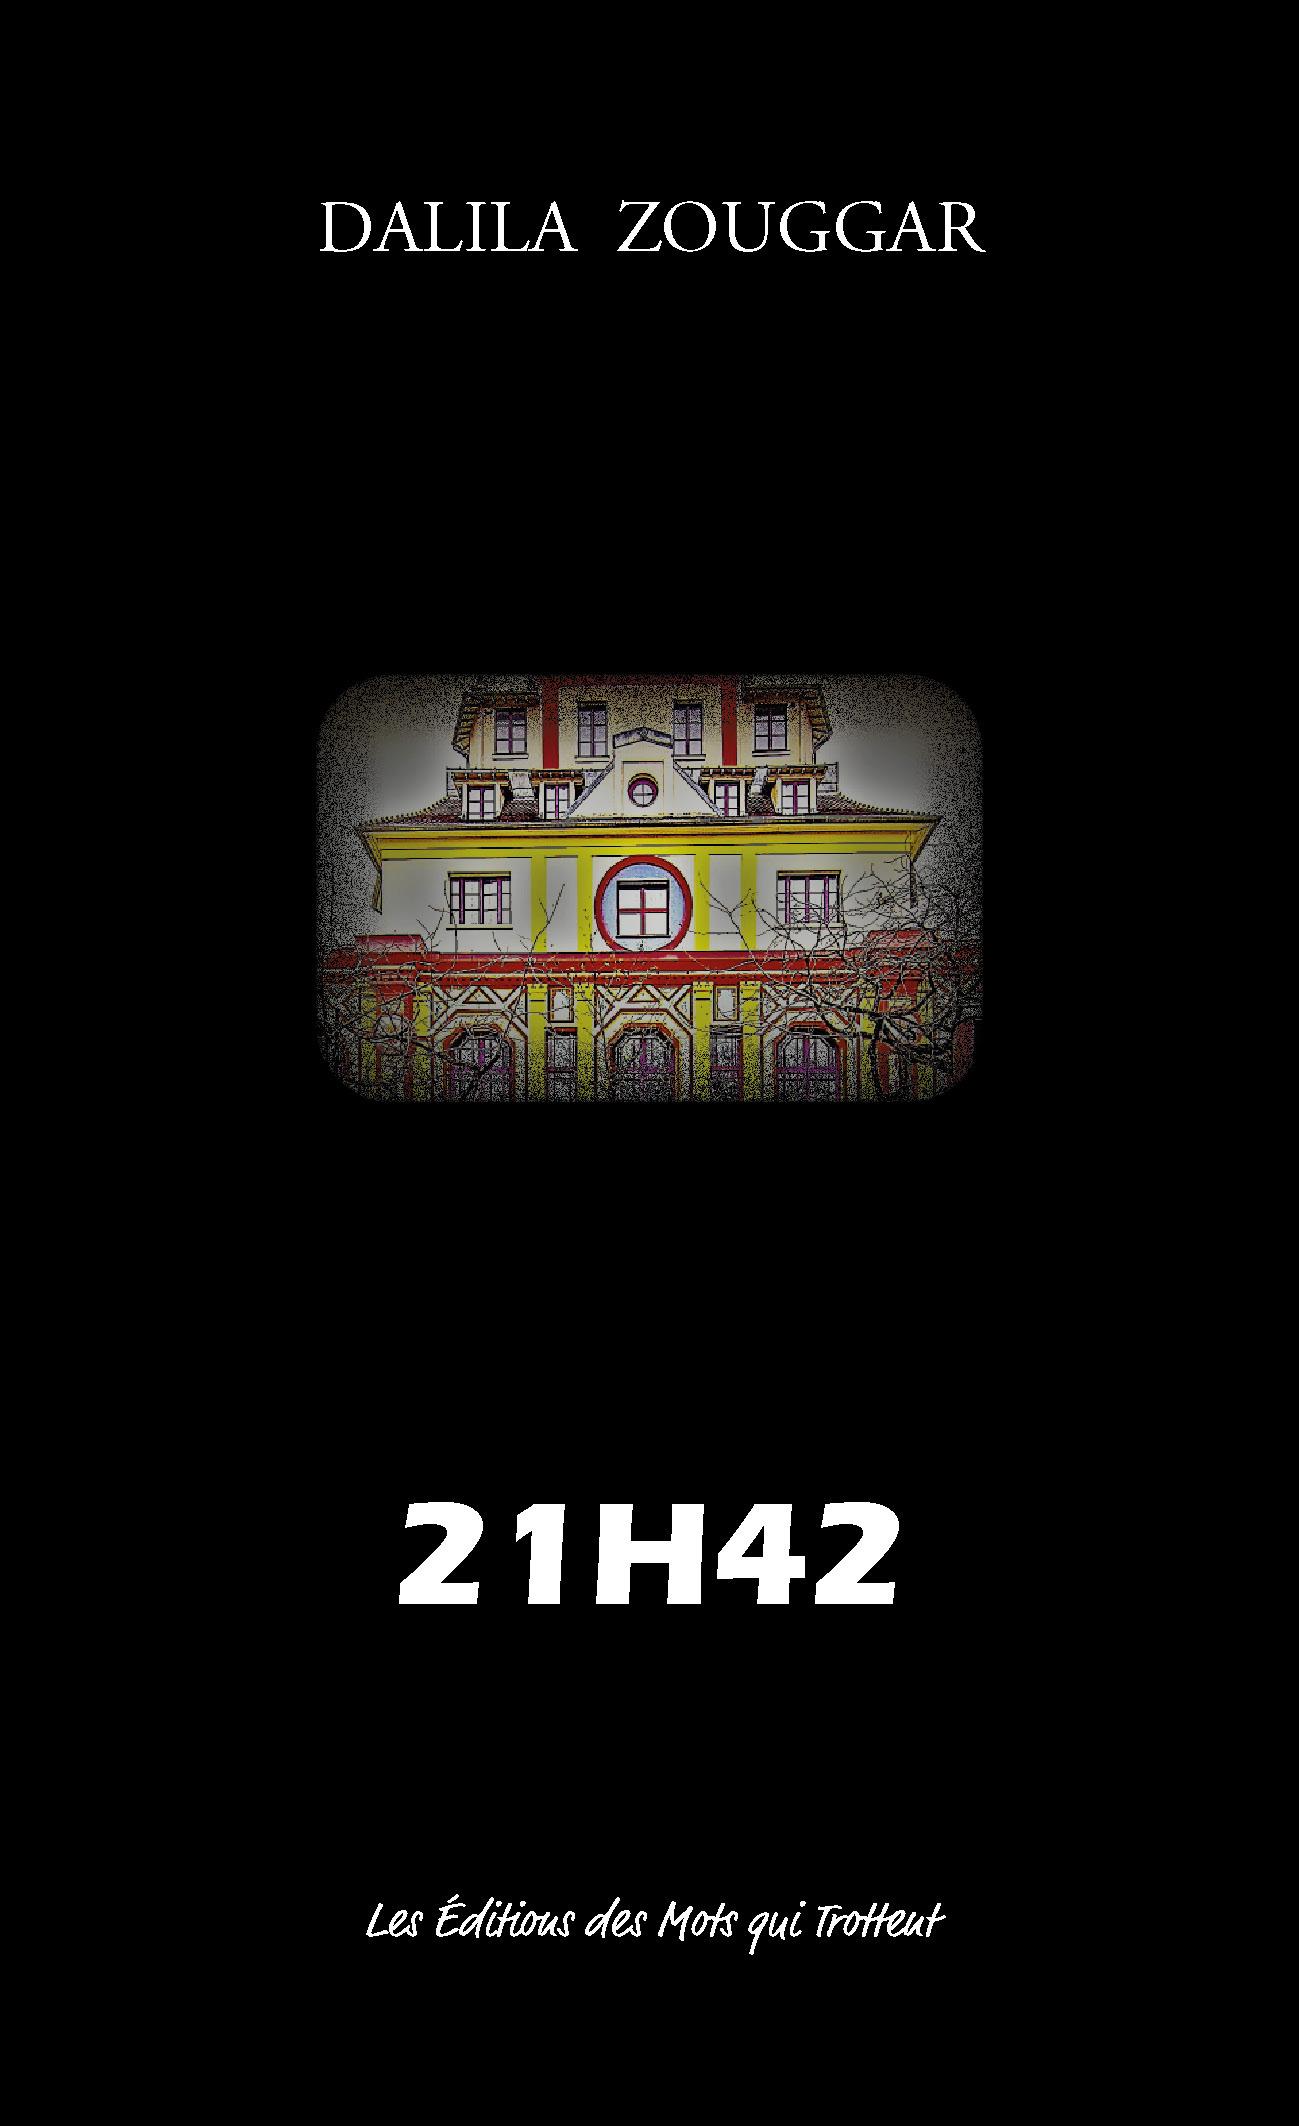 21 H 42